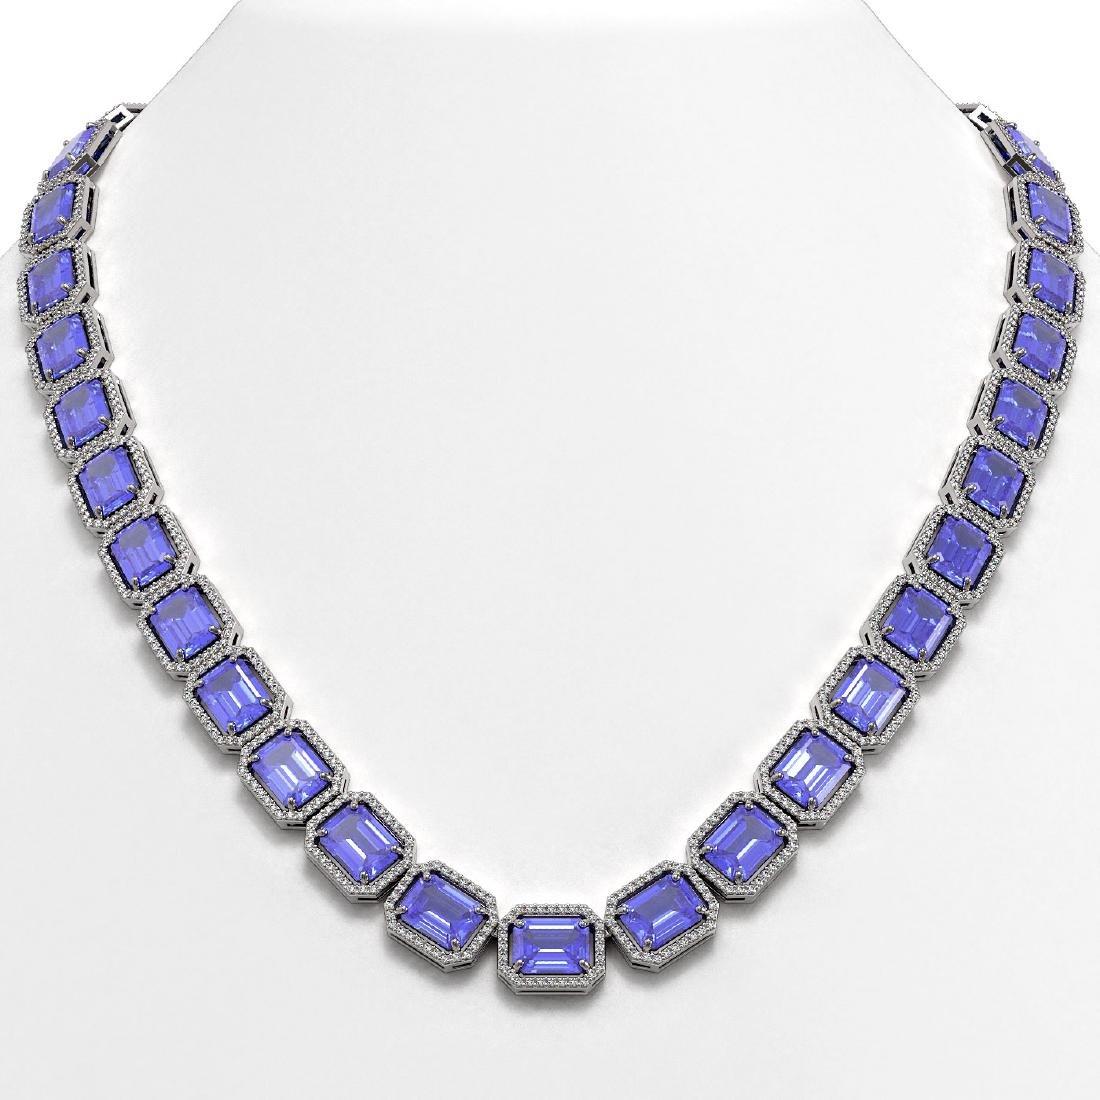 79.99 CTW Tanzanite & Diamond Halo Necklace 10K White